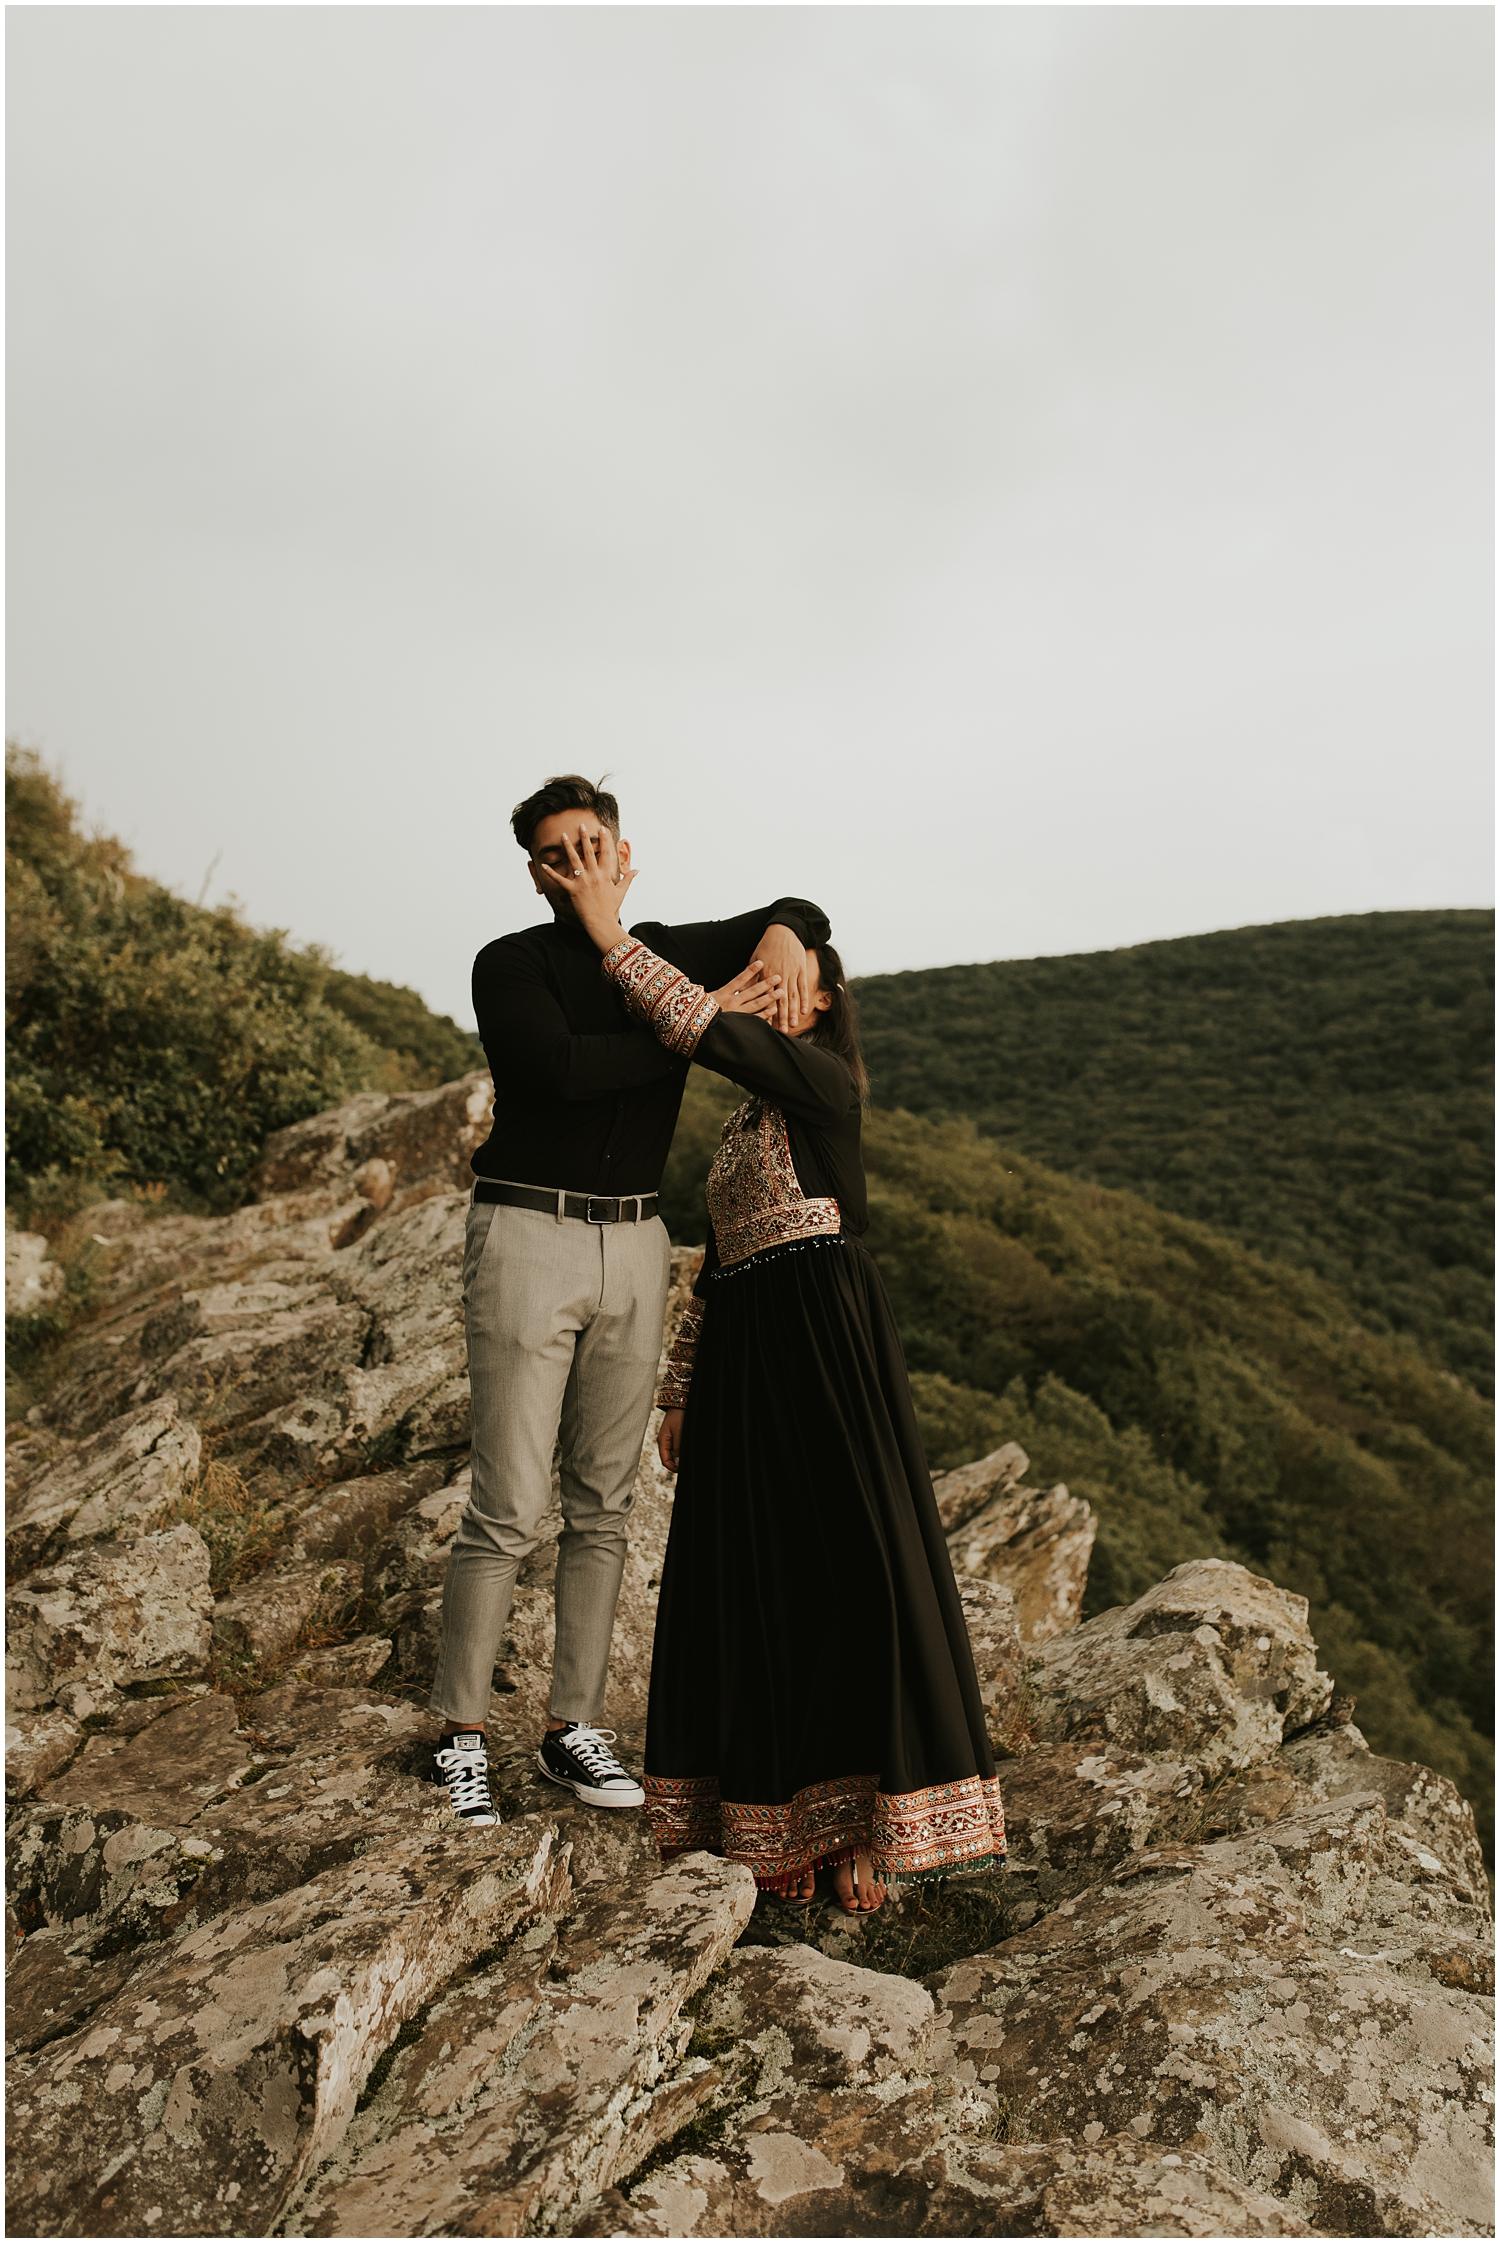 Hannah_Baldwin_Photography_Shenandoah_national_park_Engagement_Session_Traditional_Afghan_0108.jpg